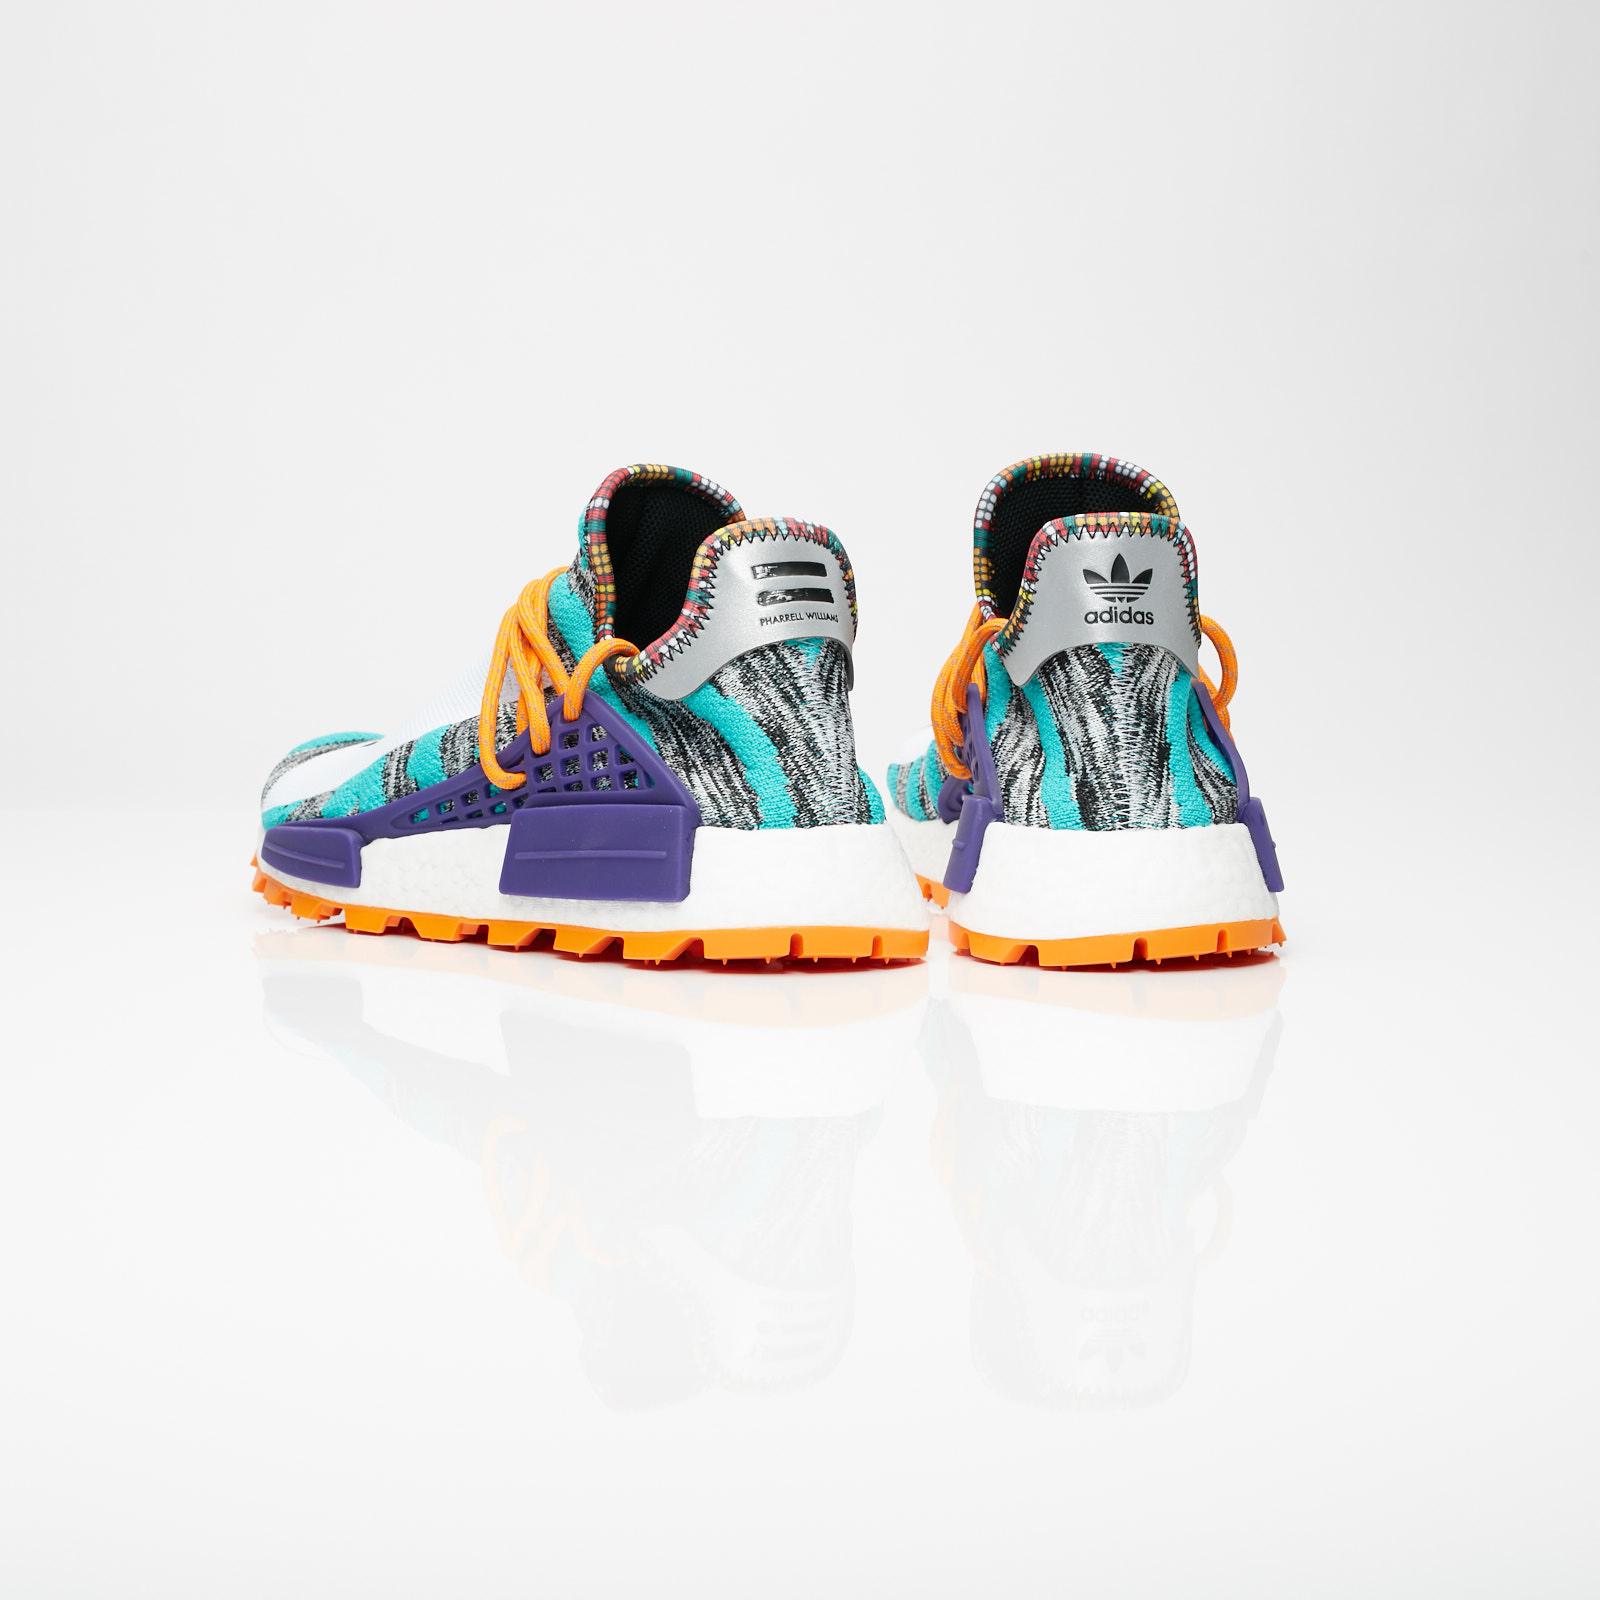 1aaddd772 adidas Solar HU NMD x Pharrell Williams - Bb9528 - Sneakersnstuff ...